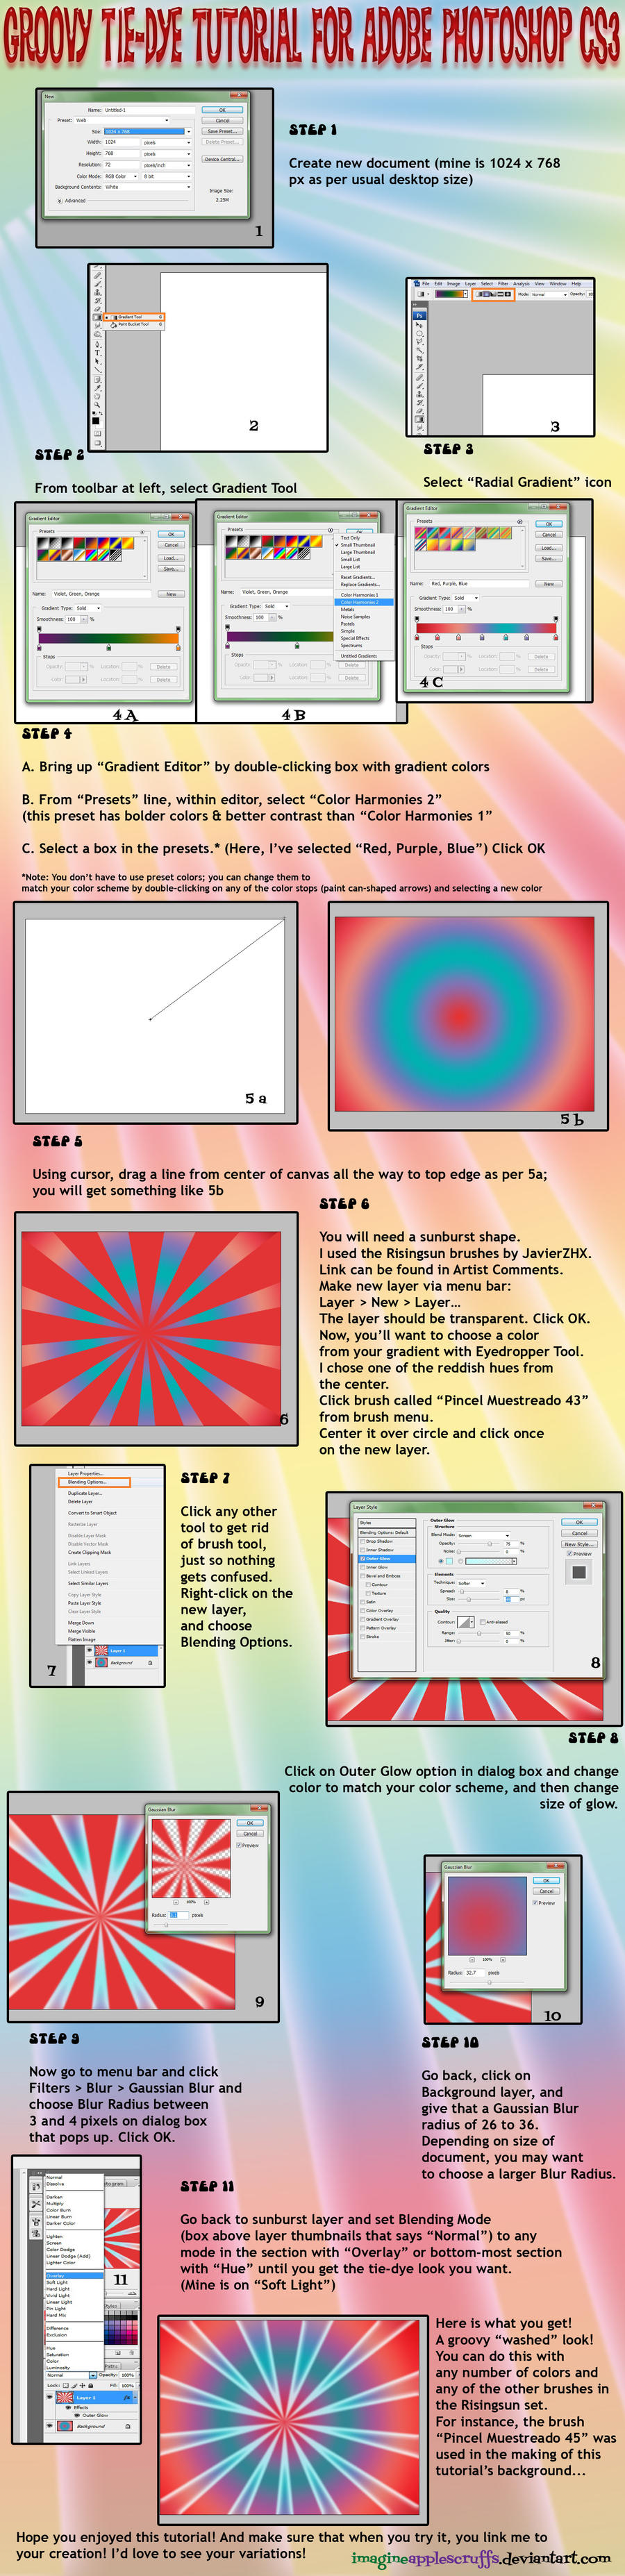 Photoshop tie dye tutorial by sagittarianism on deviantart photoshop tie dye tutorial by sagittarianism baditri Gallery